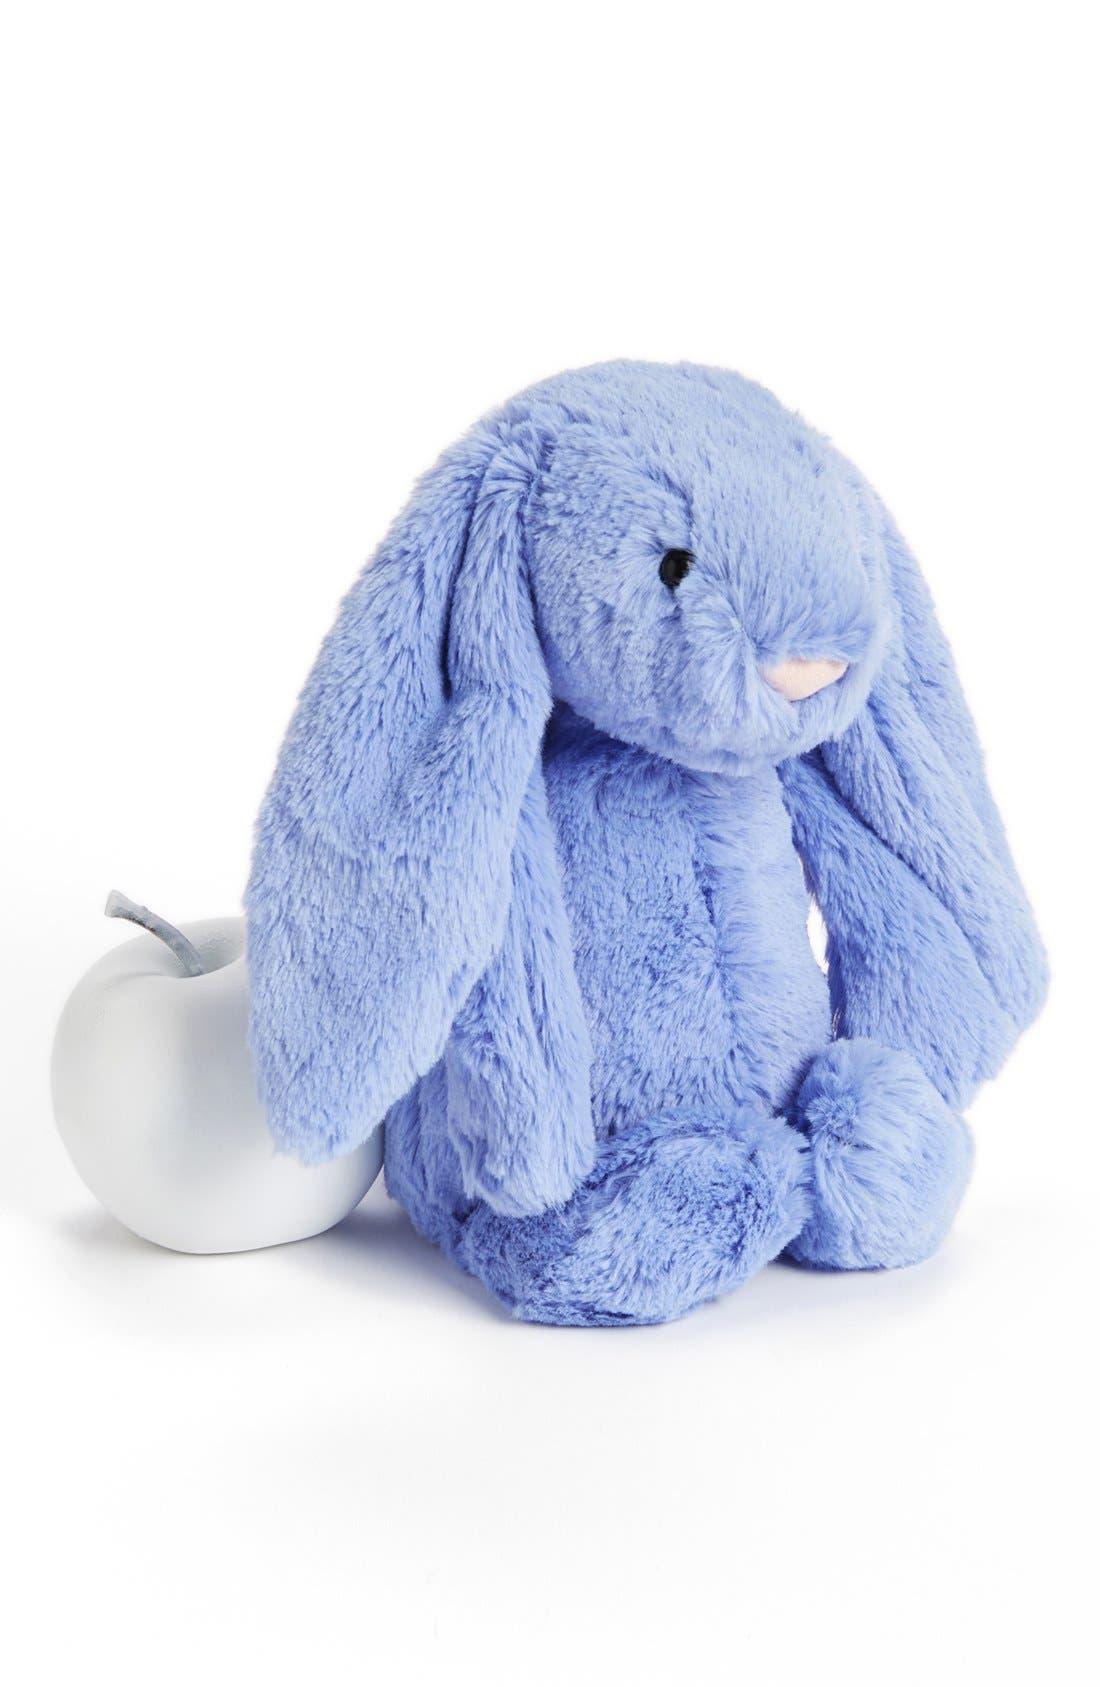 Alternate Image 1 Selected - Jellycat 'Bashful Bunny' Stuffed Animal